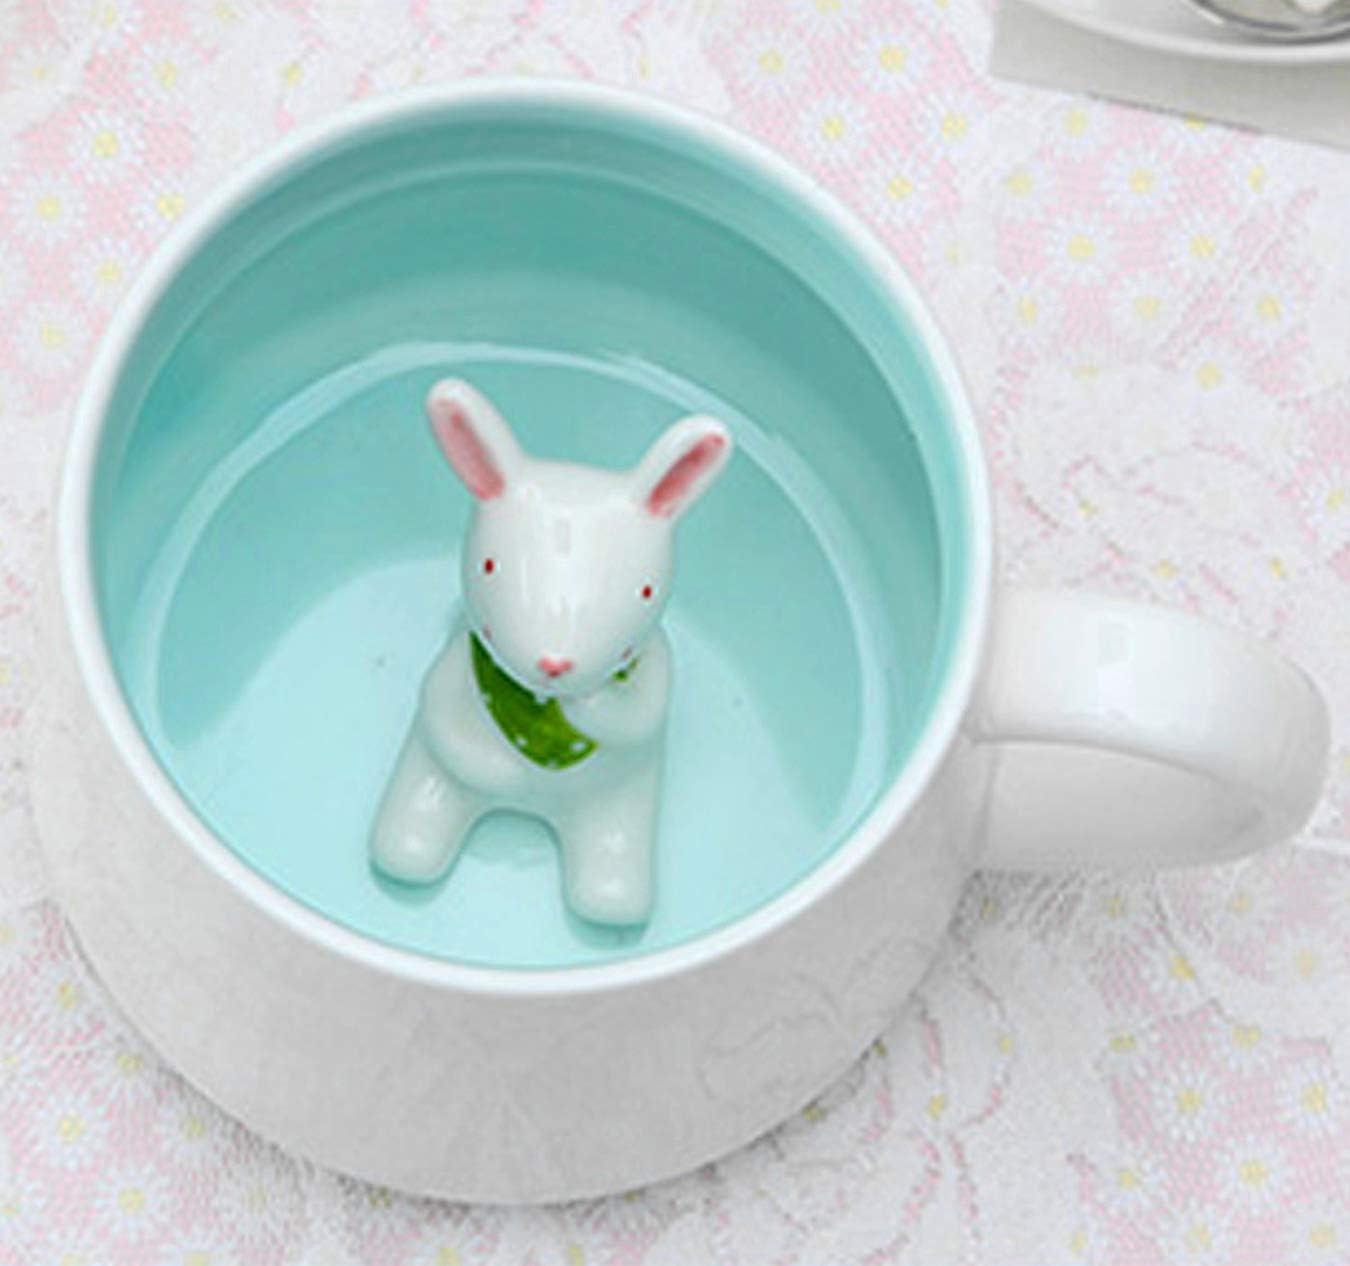 3D Ceramics Teacup Animal Coffee Mugs 13.5 OZ Dishwasher & Microwave Safe